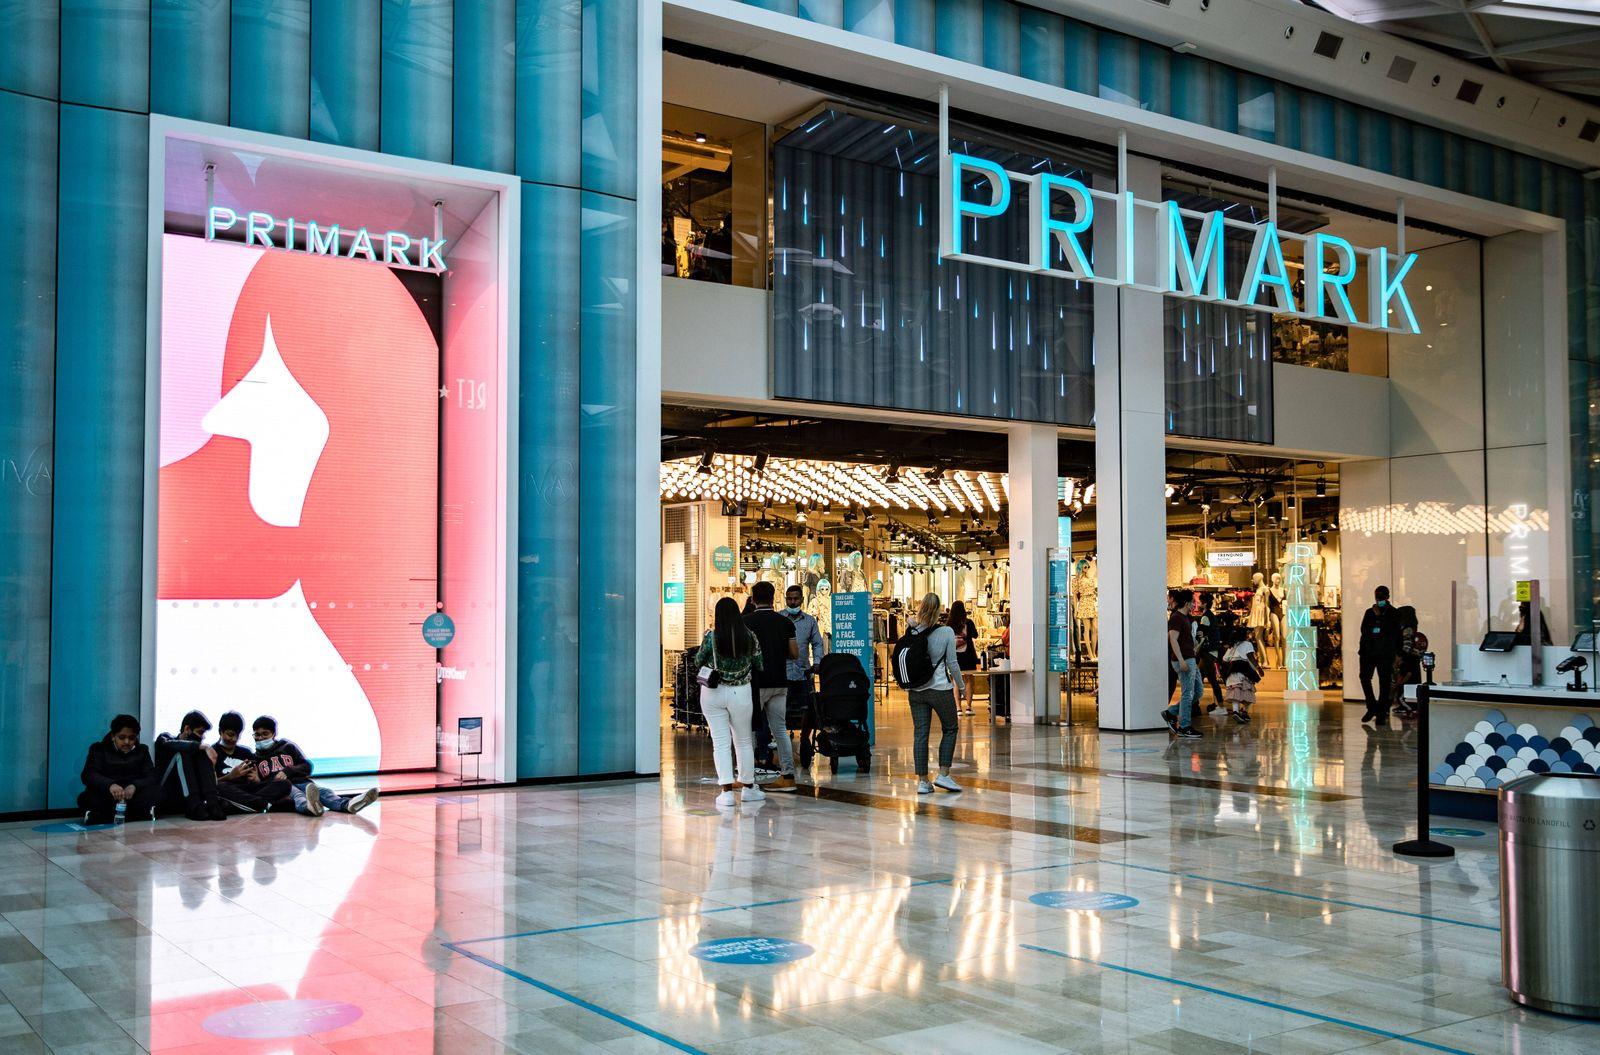 May 29, 2021, London, United Kingdom: People seen inside Primark, the Irish fast fashion retailer in London. London Unit